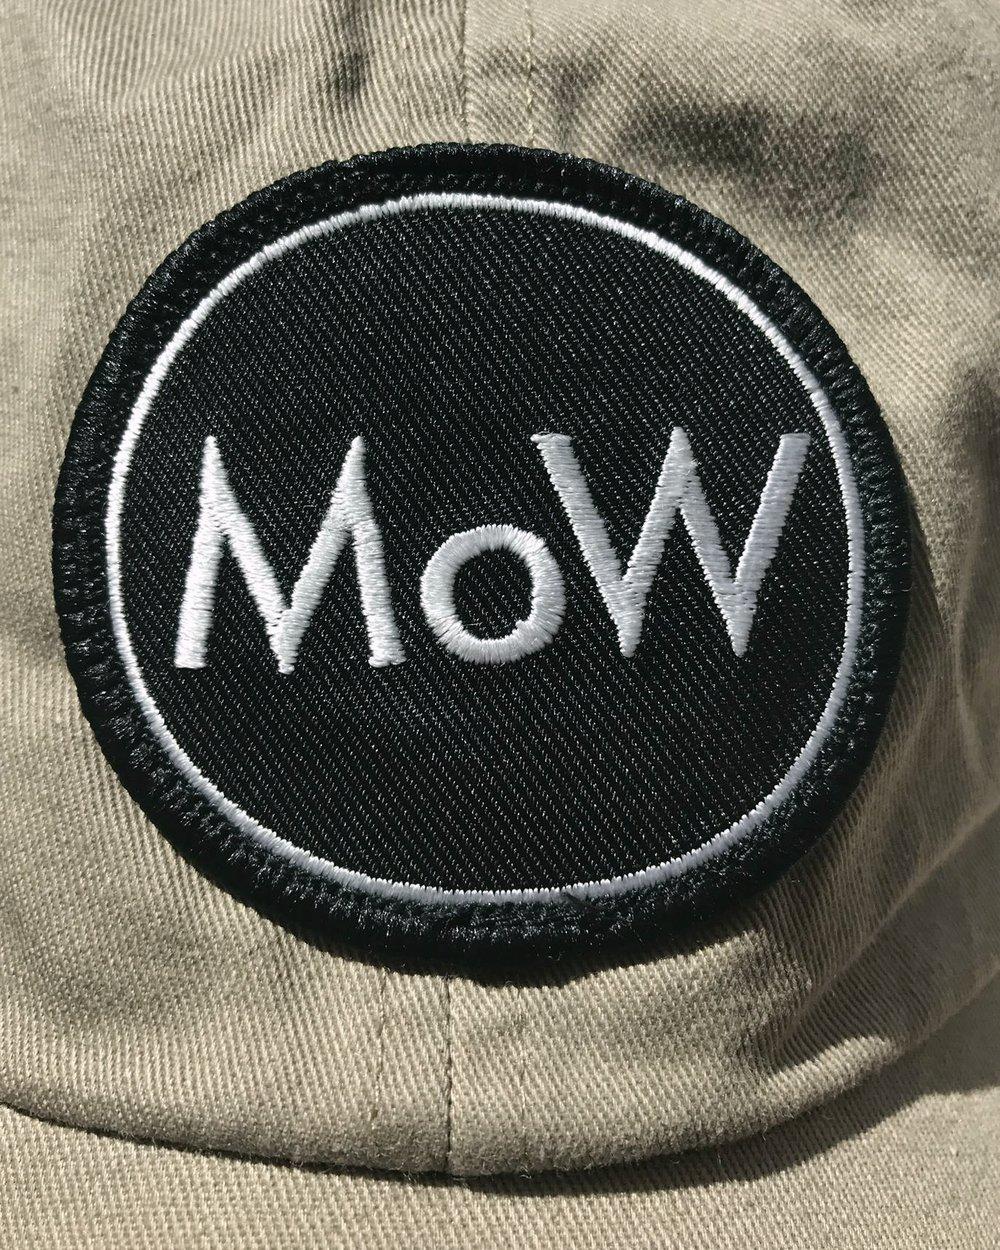 mow-hat4.jpg